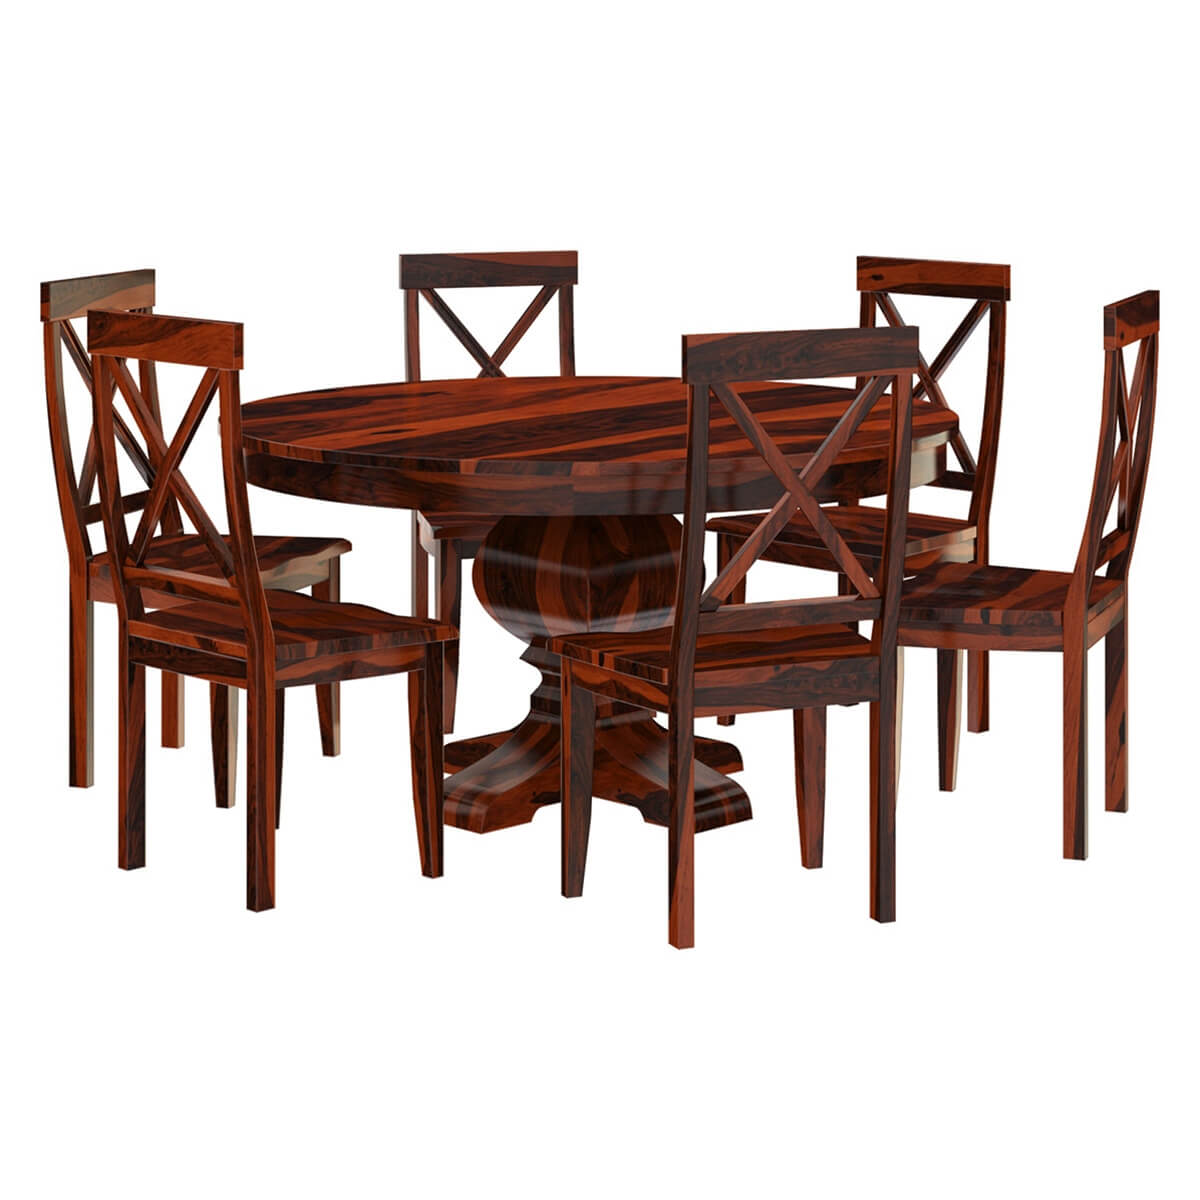 Solid Wood Dining Room Set: Missouri Solid Wood 8 Piece Round Dining Room Set